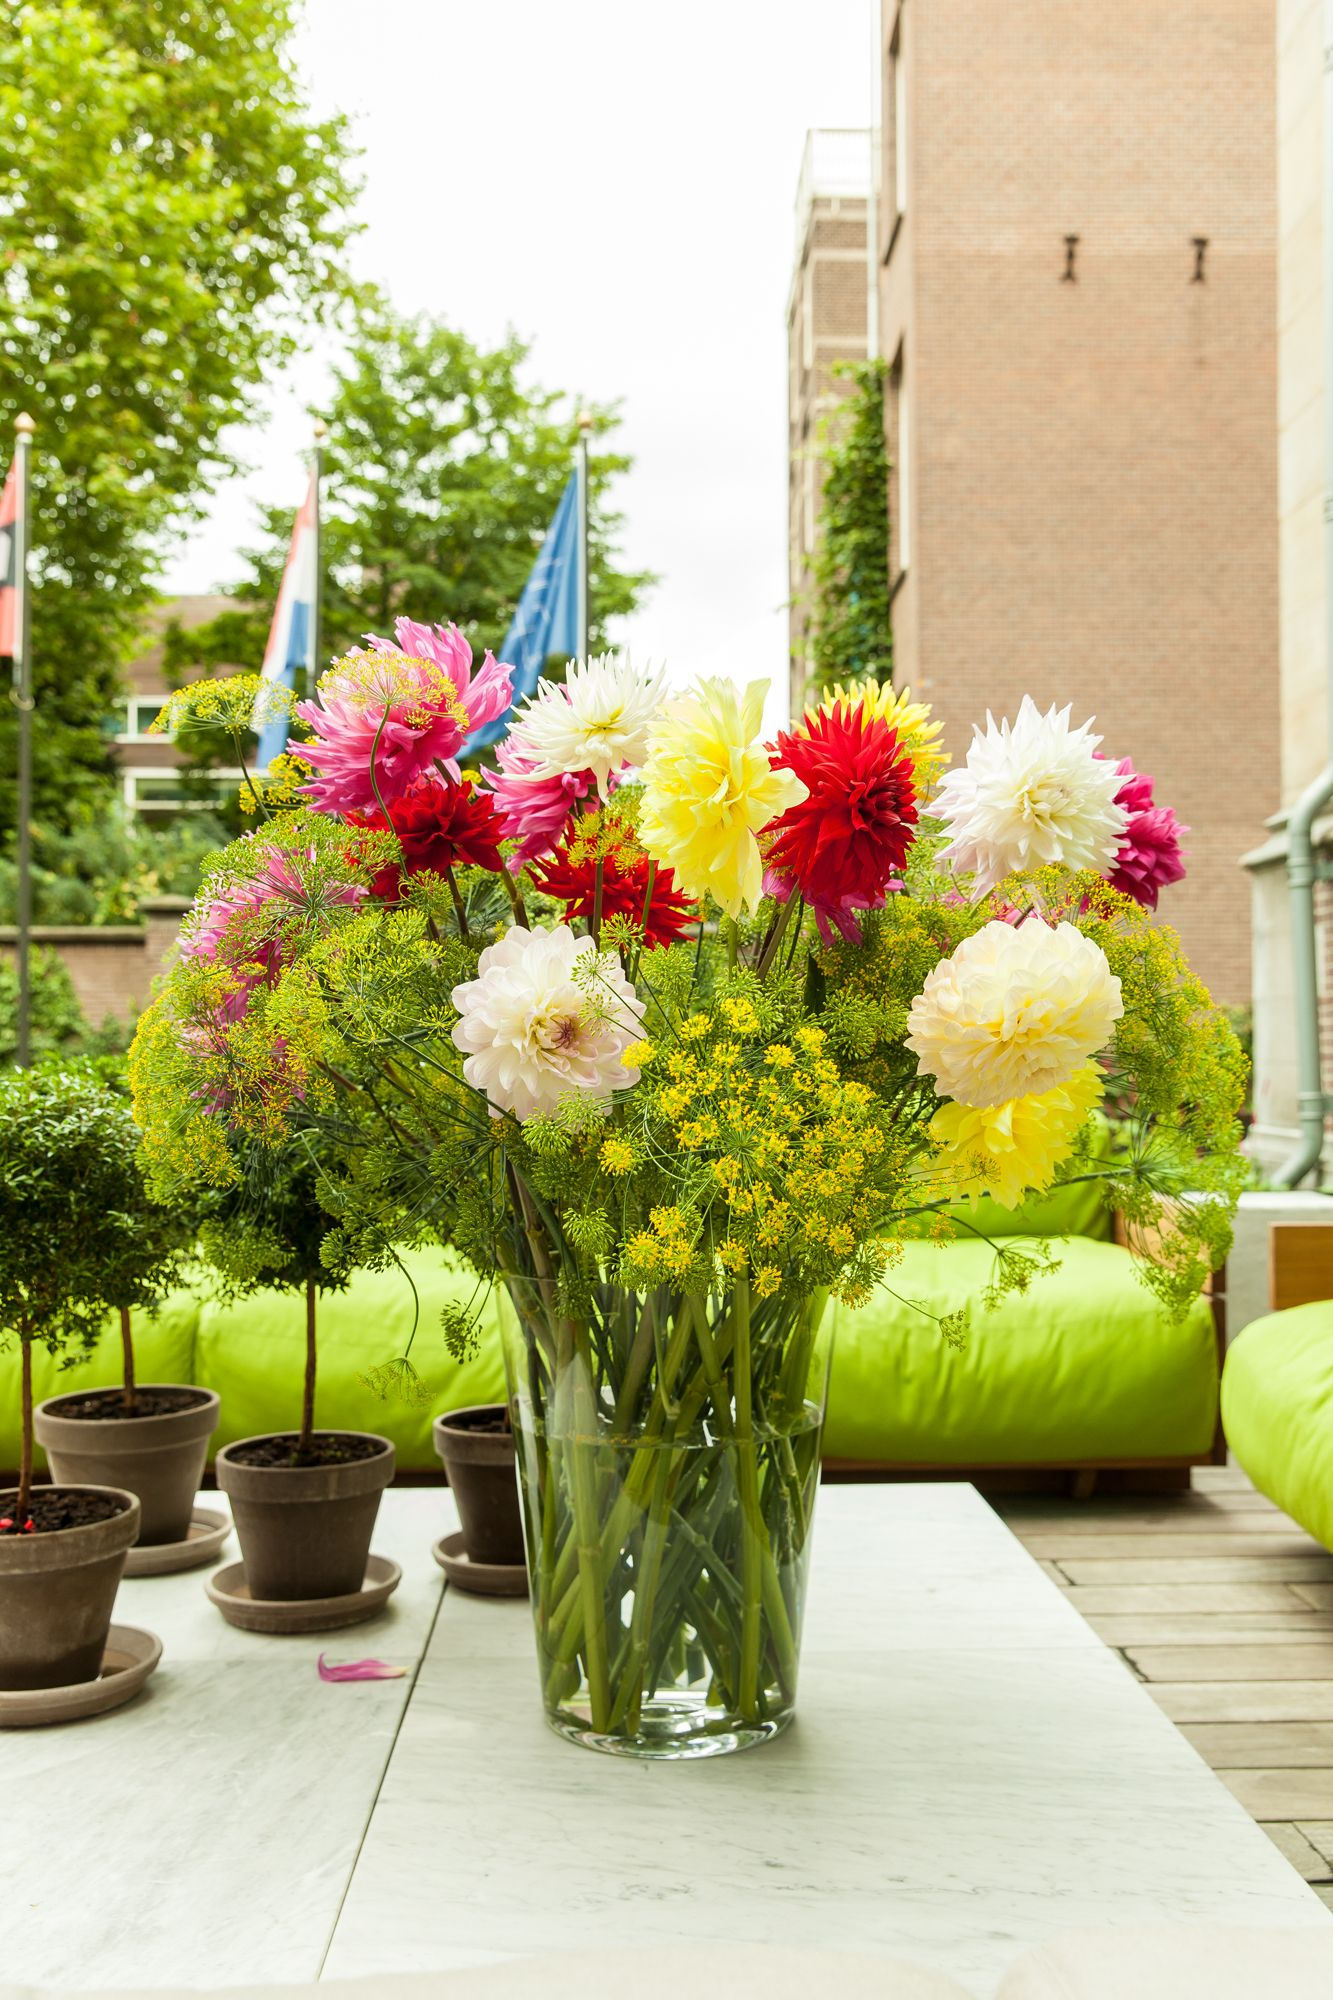 PreDrinks party of the Open Garden Days in Amsterdam